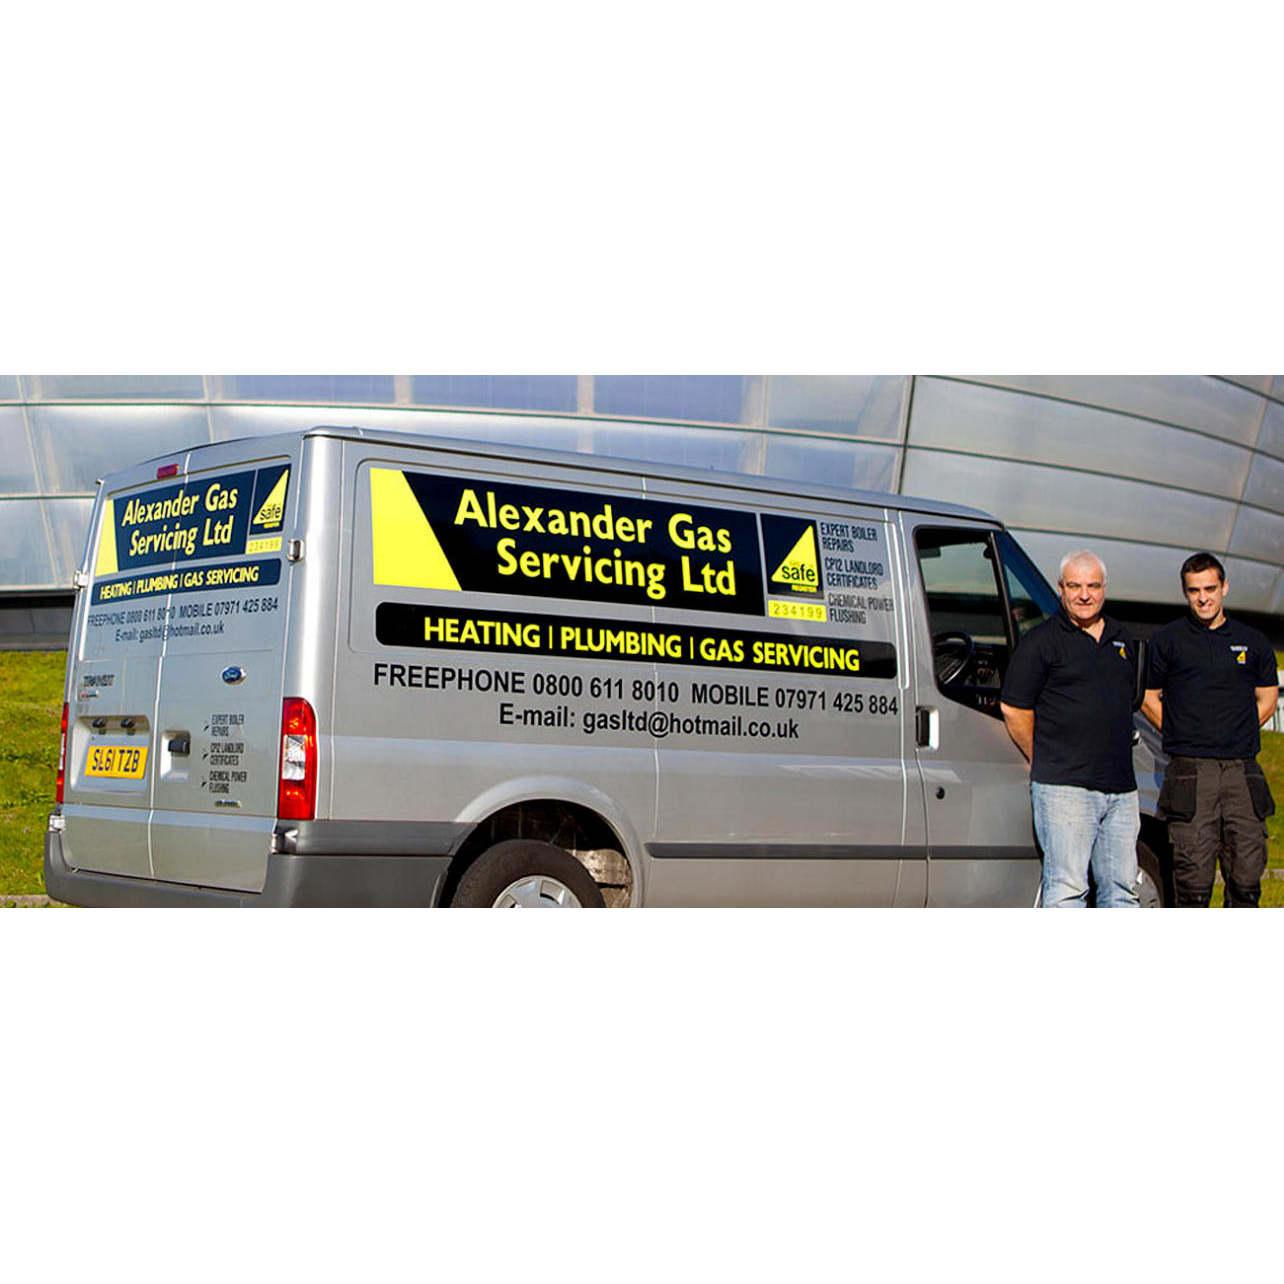 Alexander Gas Servicing Ltd